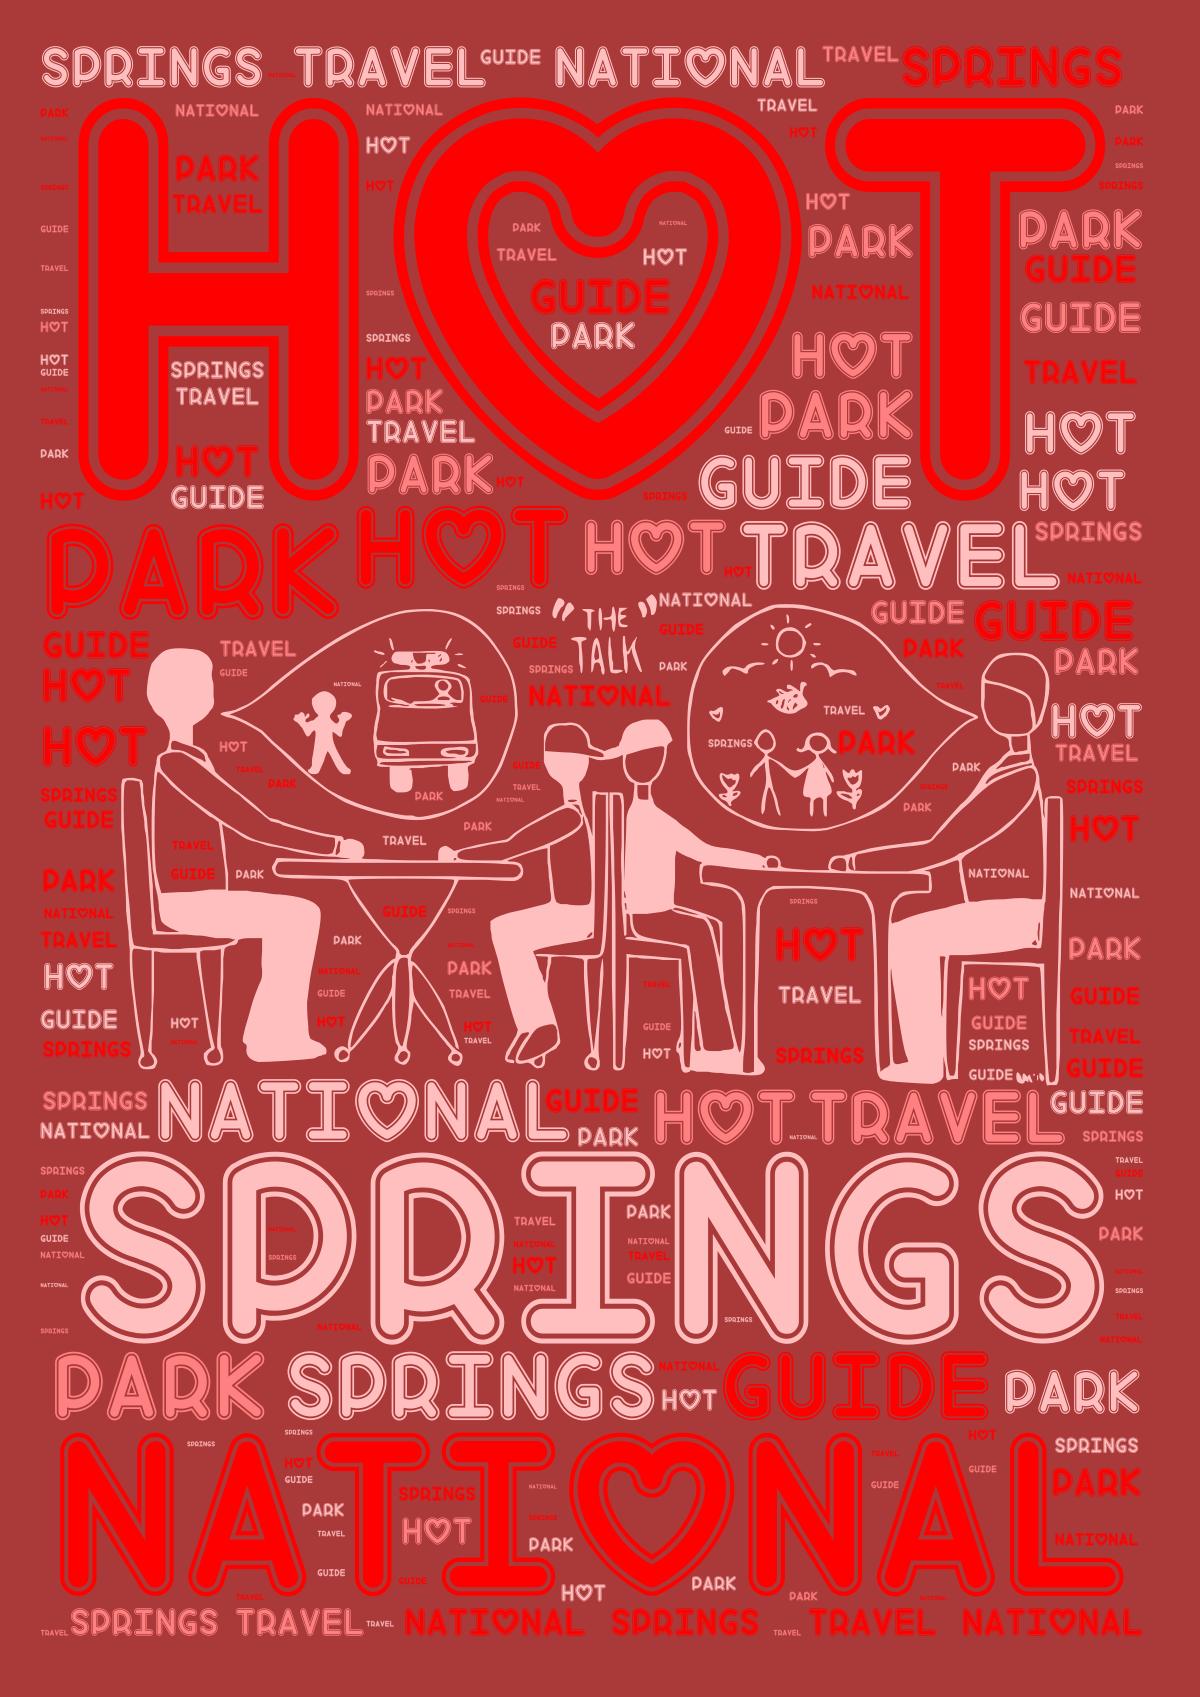 Hot Springs National Park Travel Guide